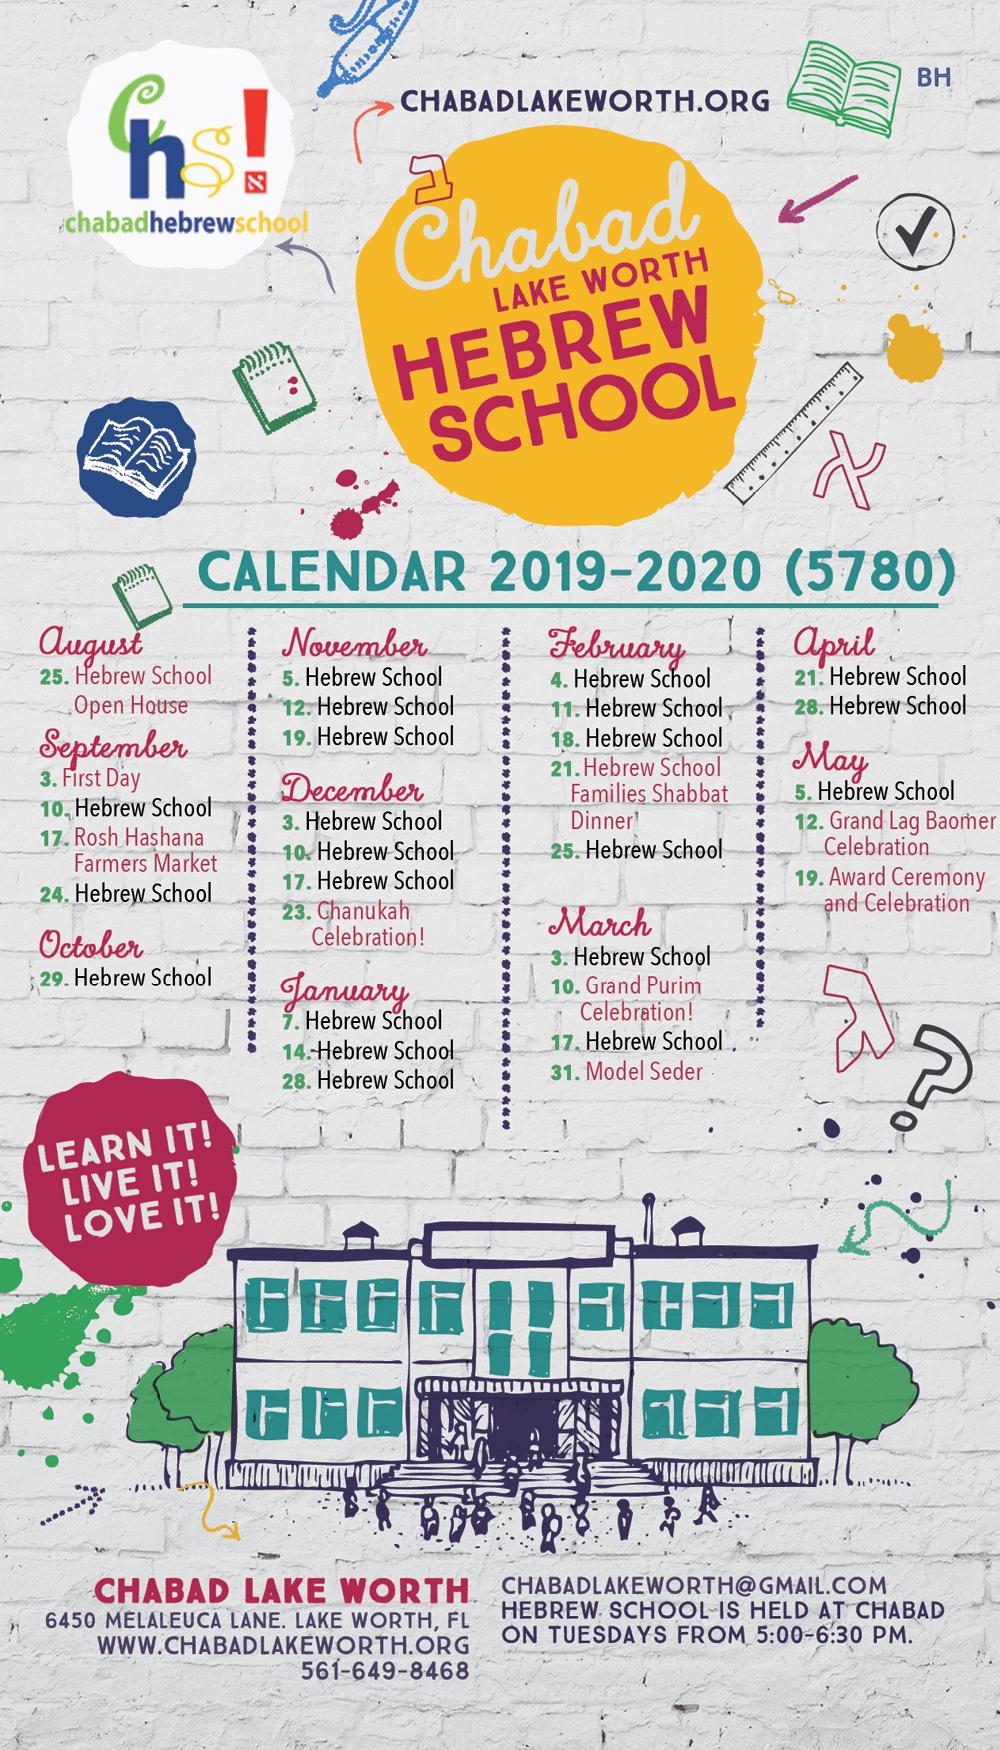 Calendar 2019- 2020 - Chabad Of Lake Worth pertaining to Ewish Calendar 2019 - 2020